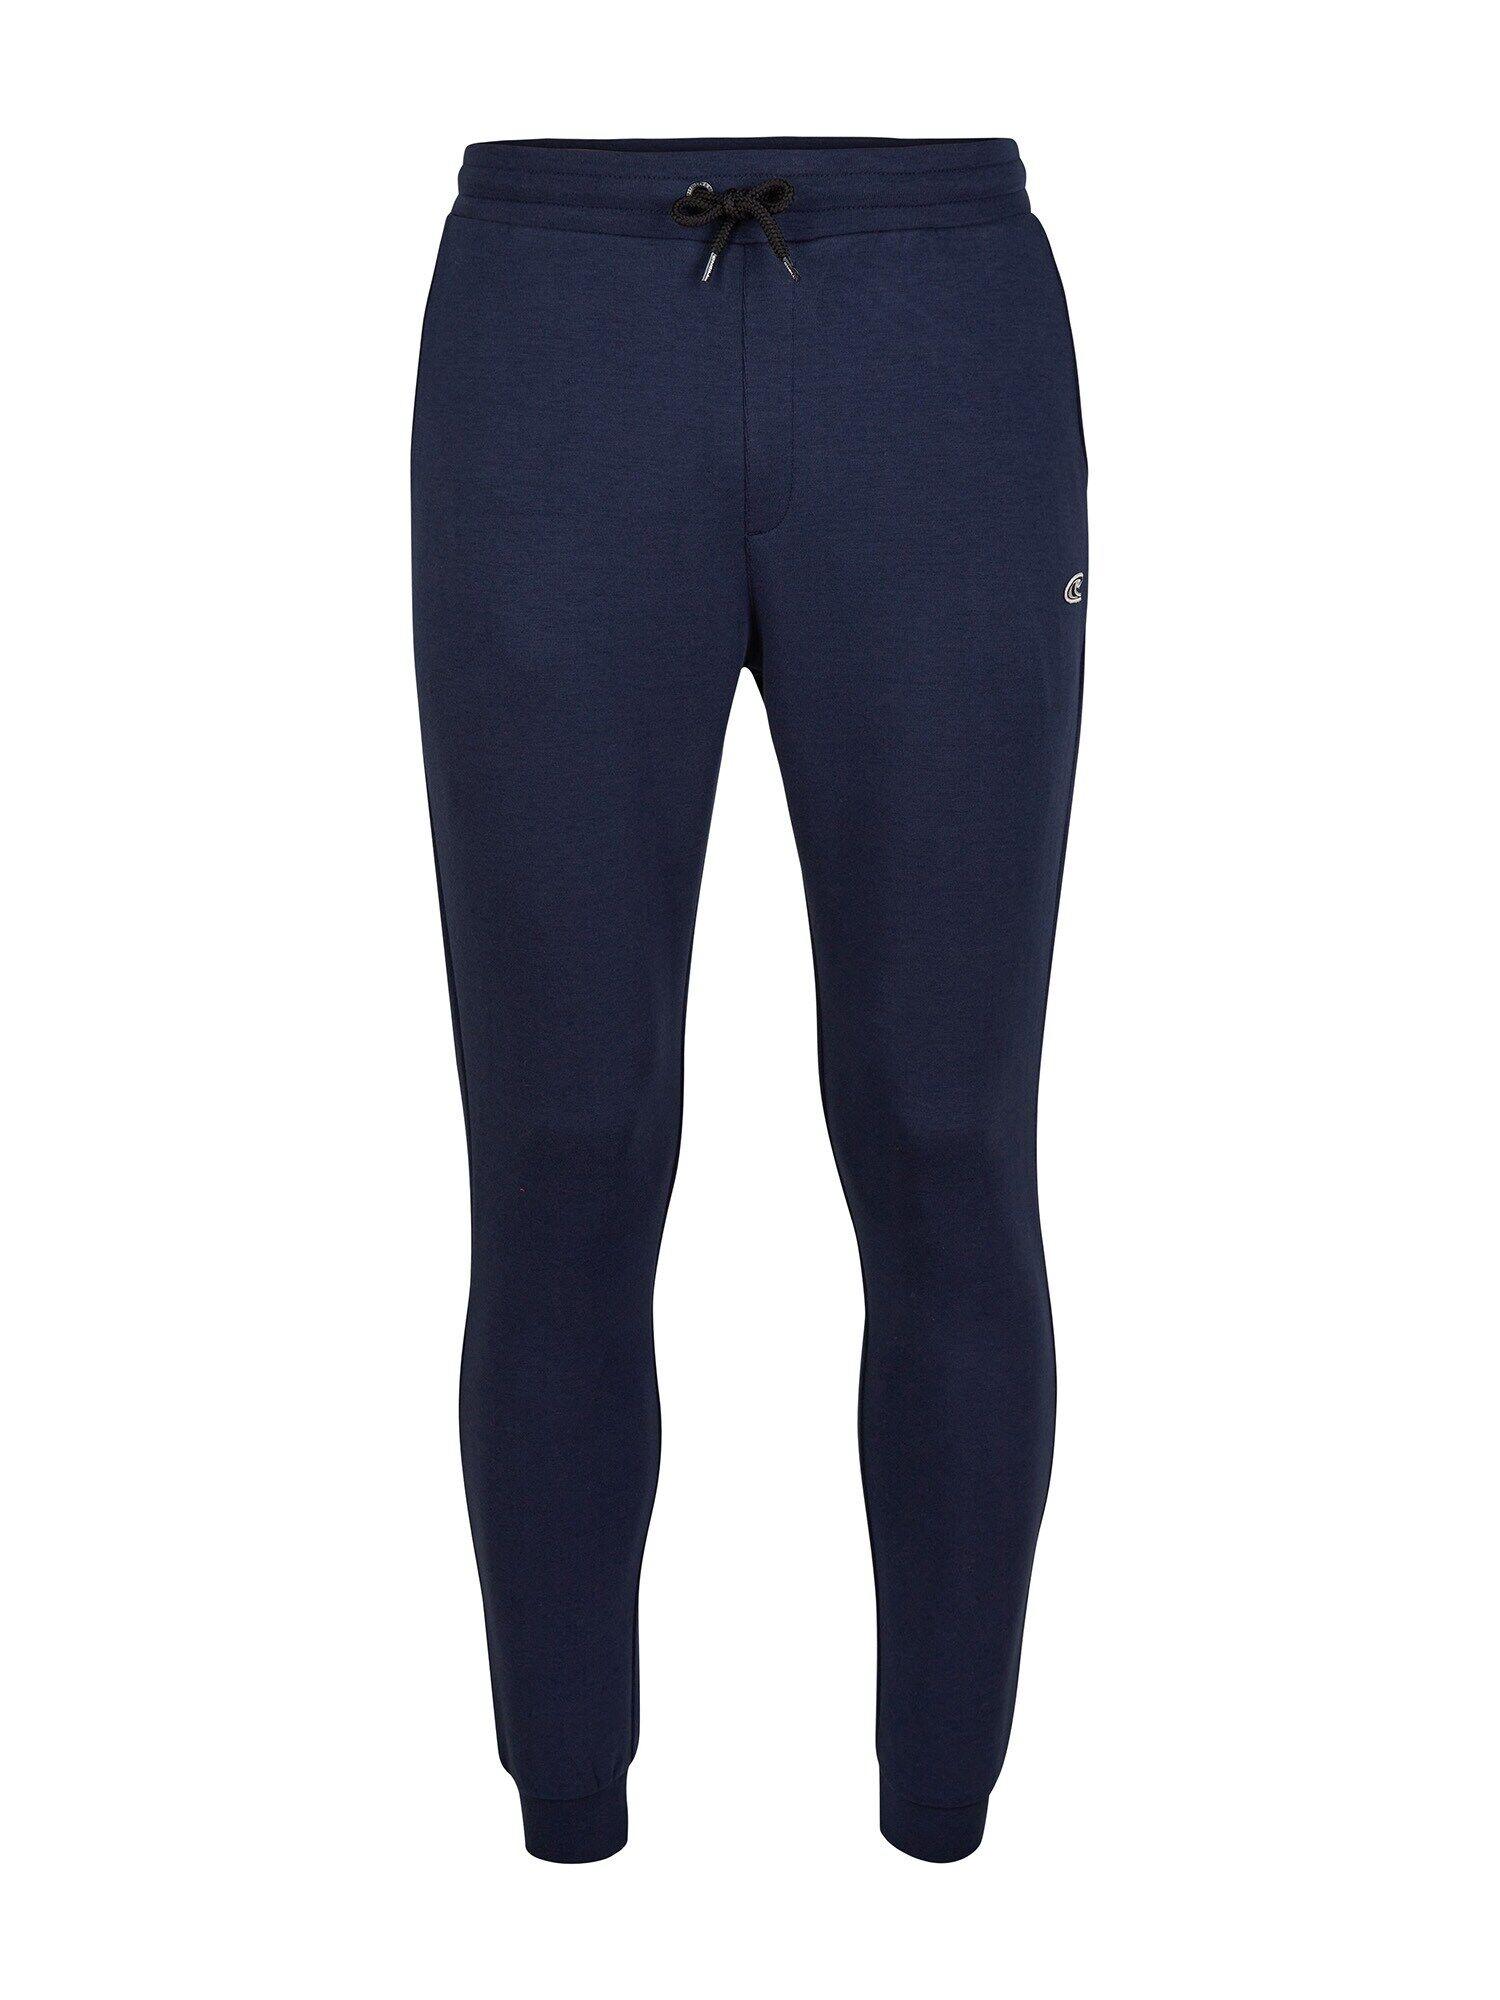 O'NEILL Pantalon 'Transit'  - Bleu - Taille: S - male